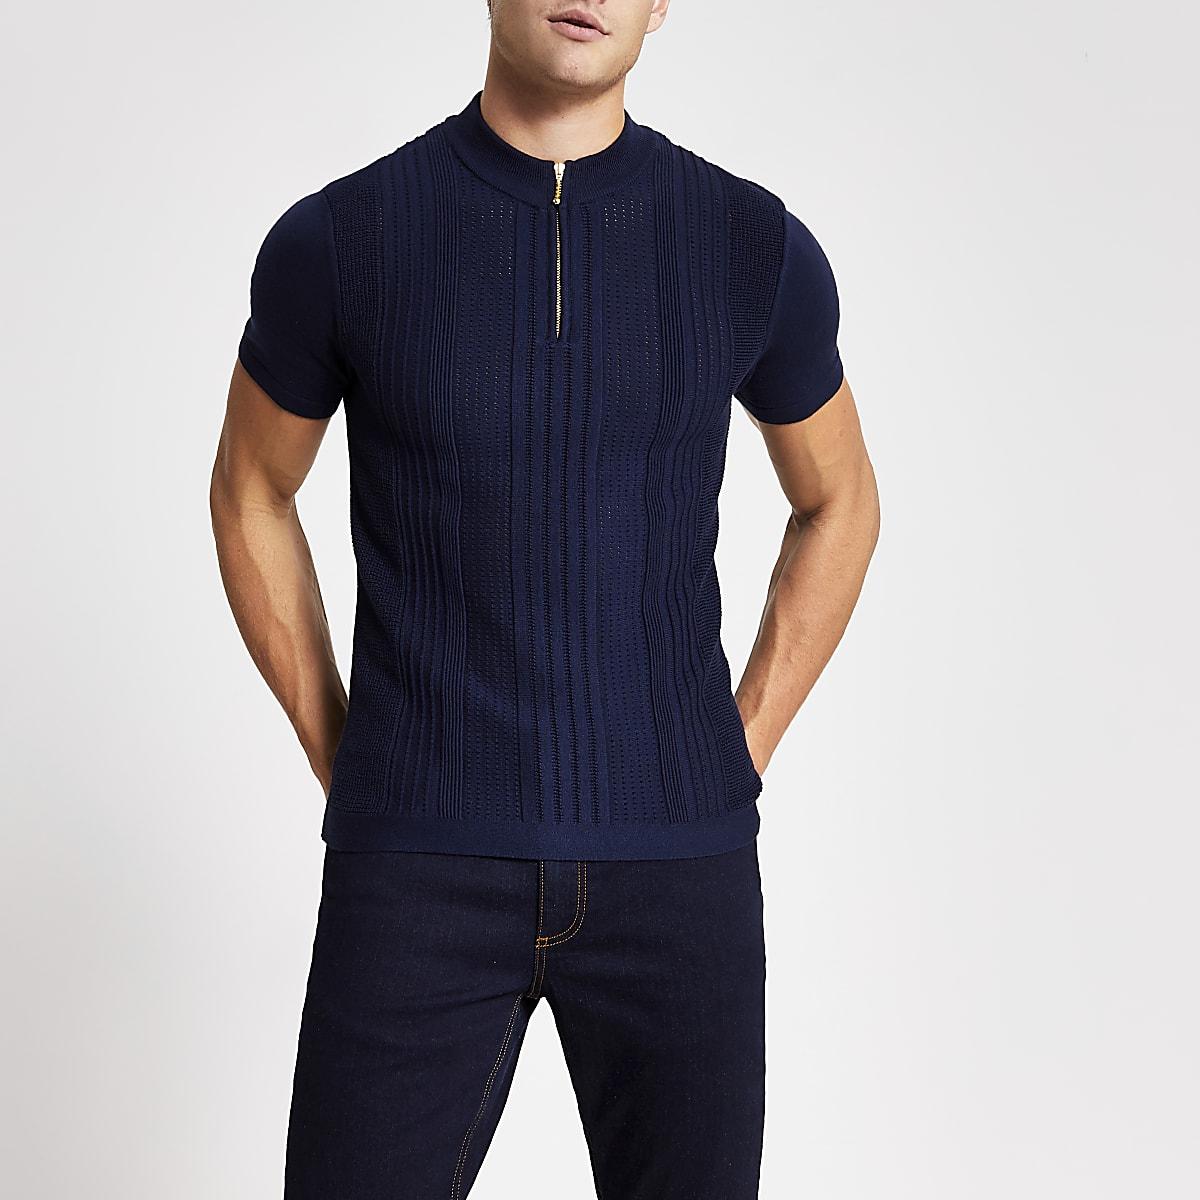 Marineblauw gebreid slim-fit T-shirt met halve ritssluiting